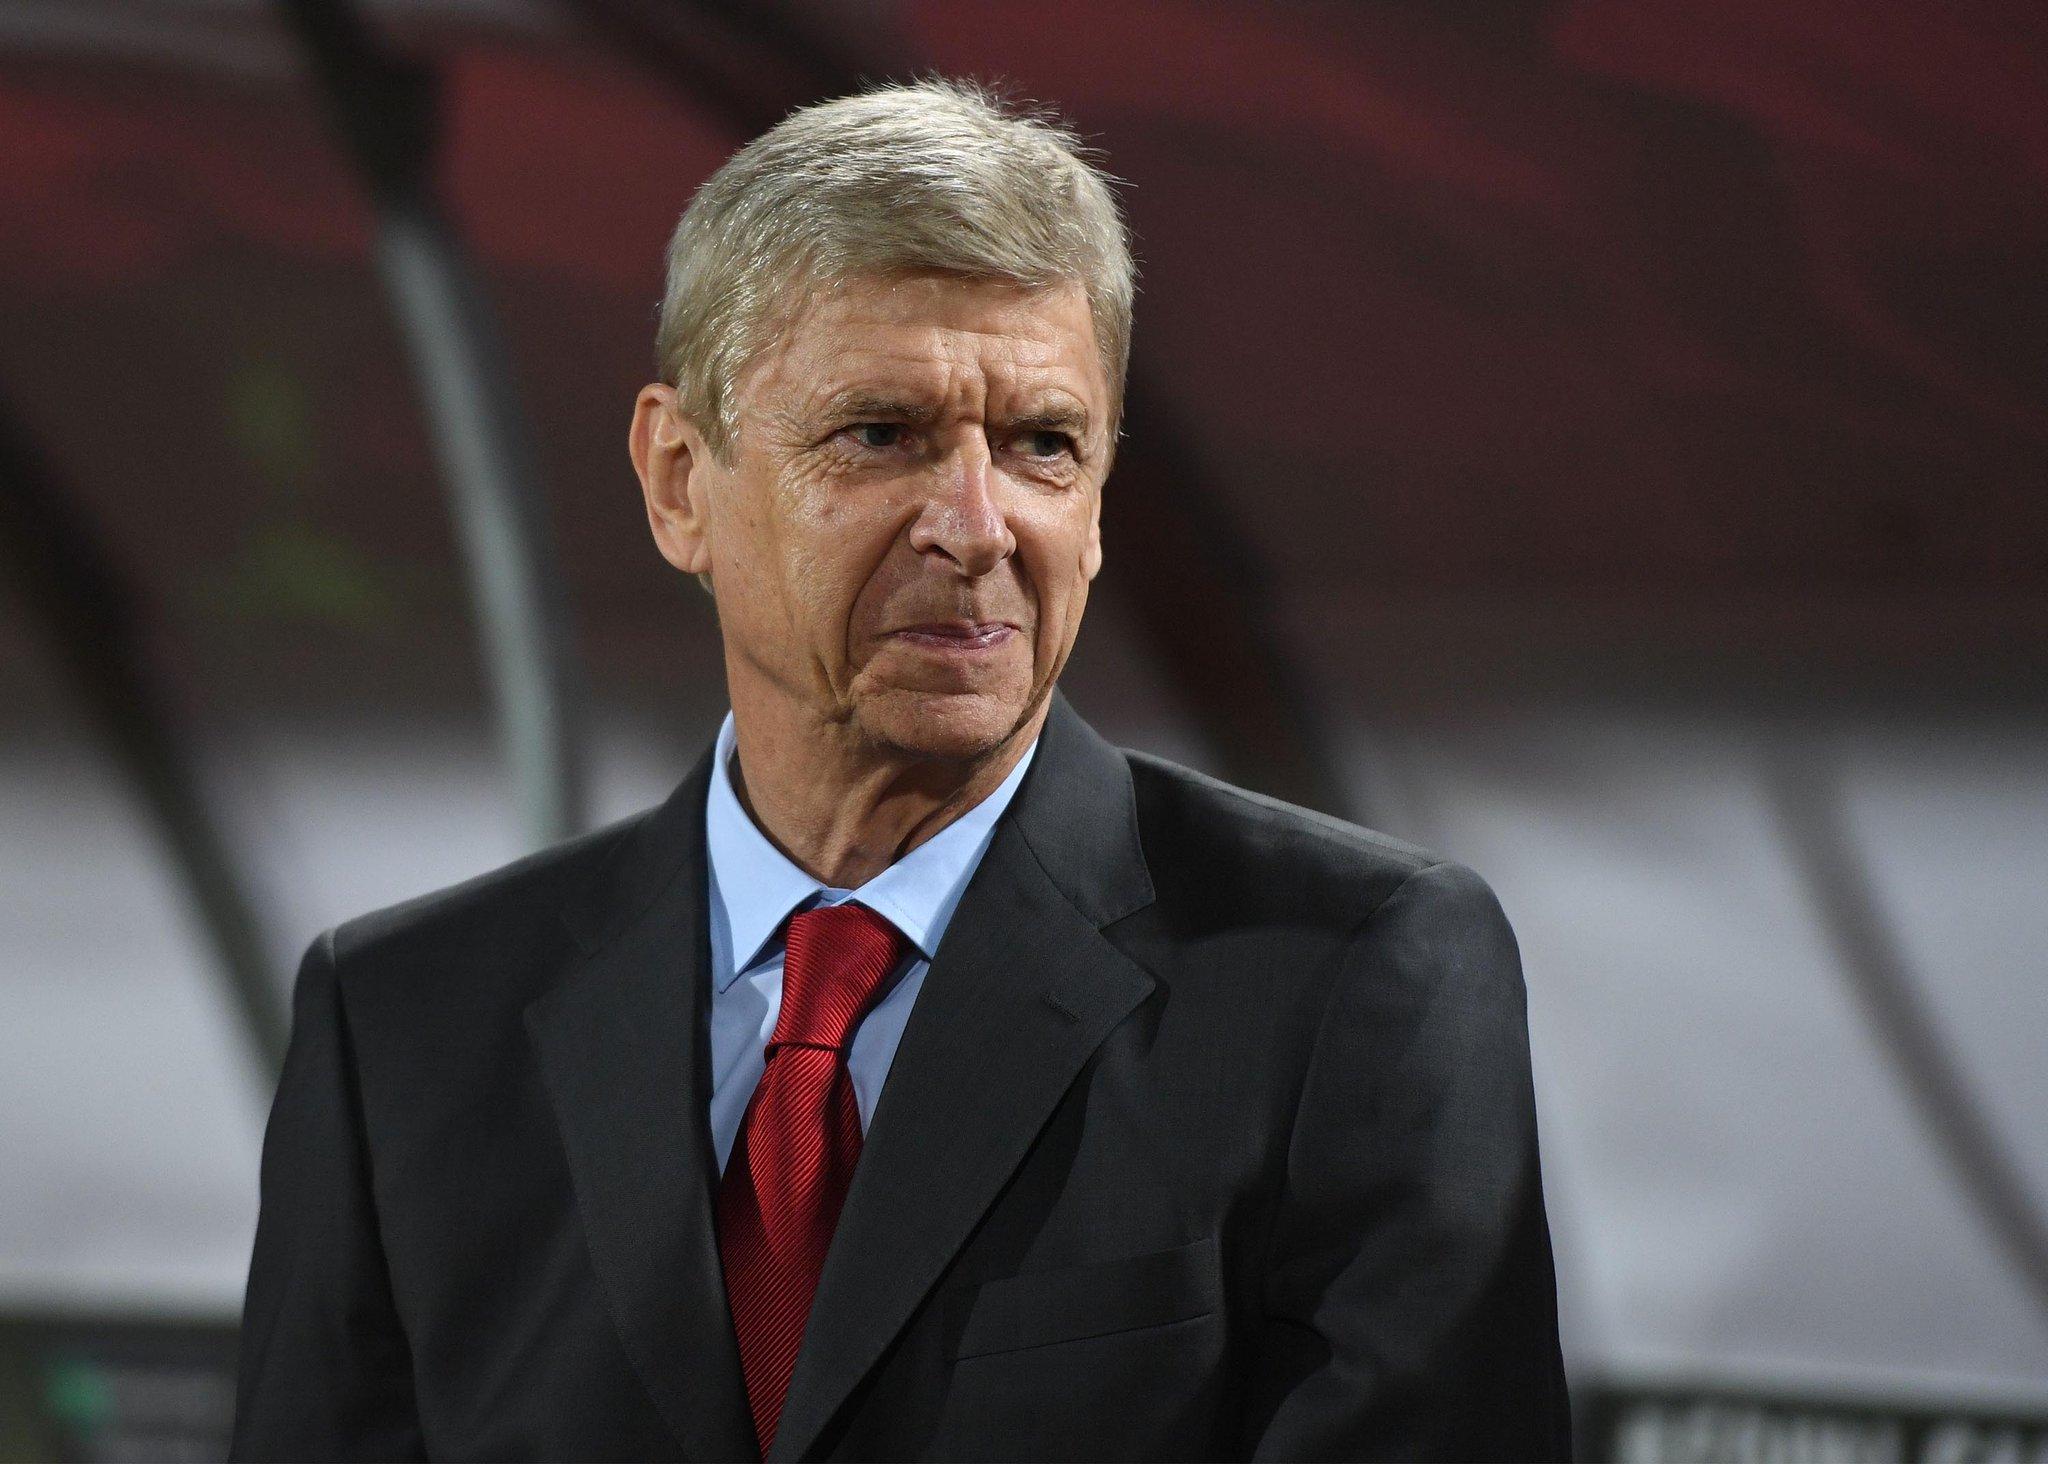 Arsène Wenger turns 68 today - happy birthday boss�� https://t.co/S5SBYfdGAr